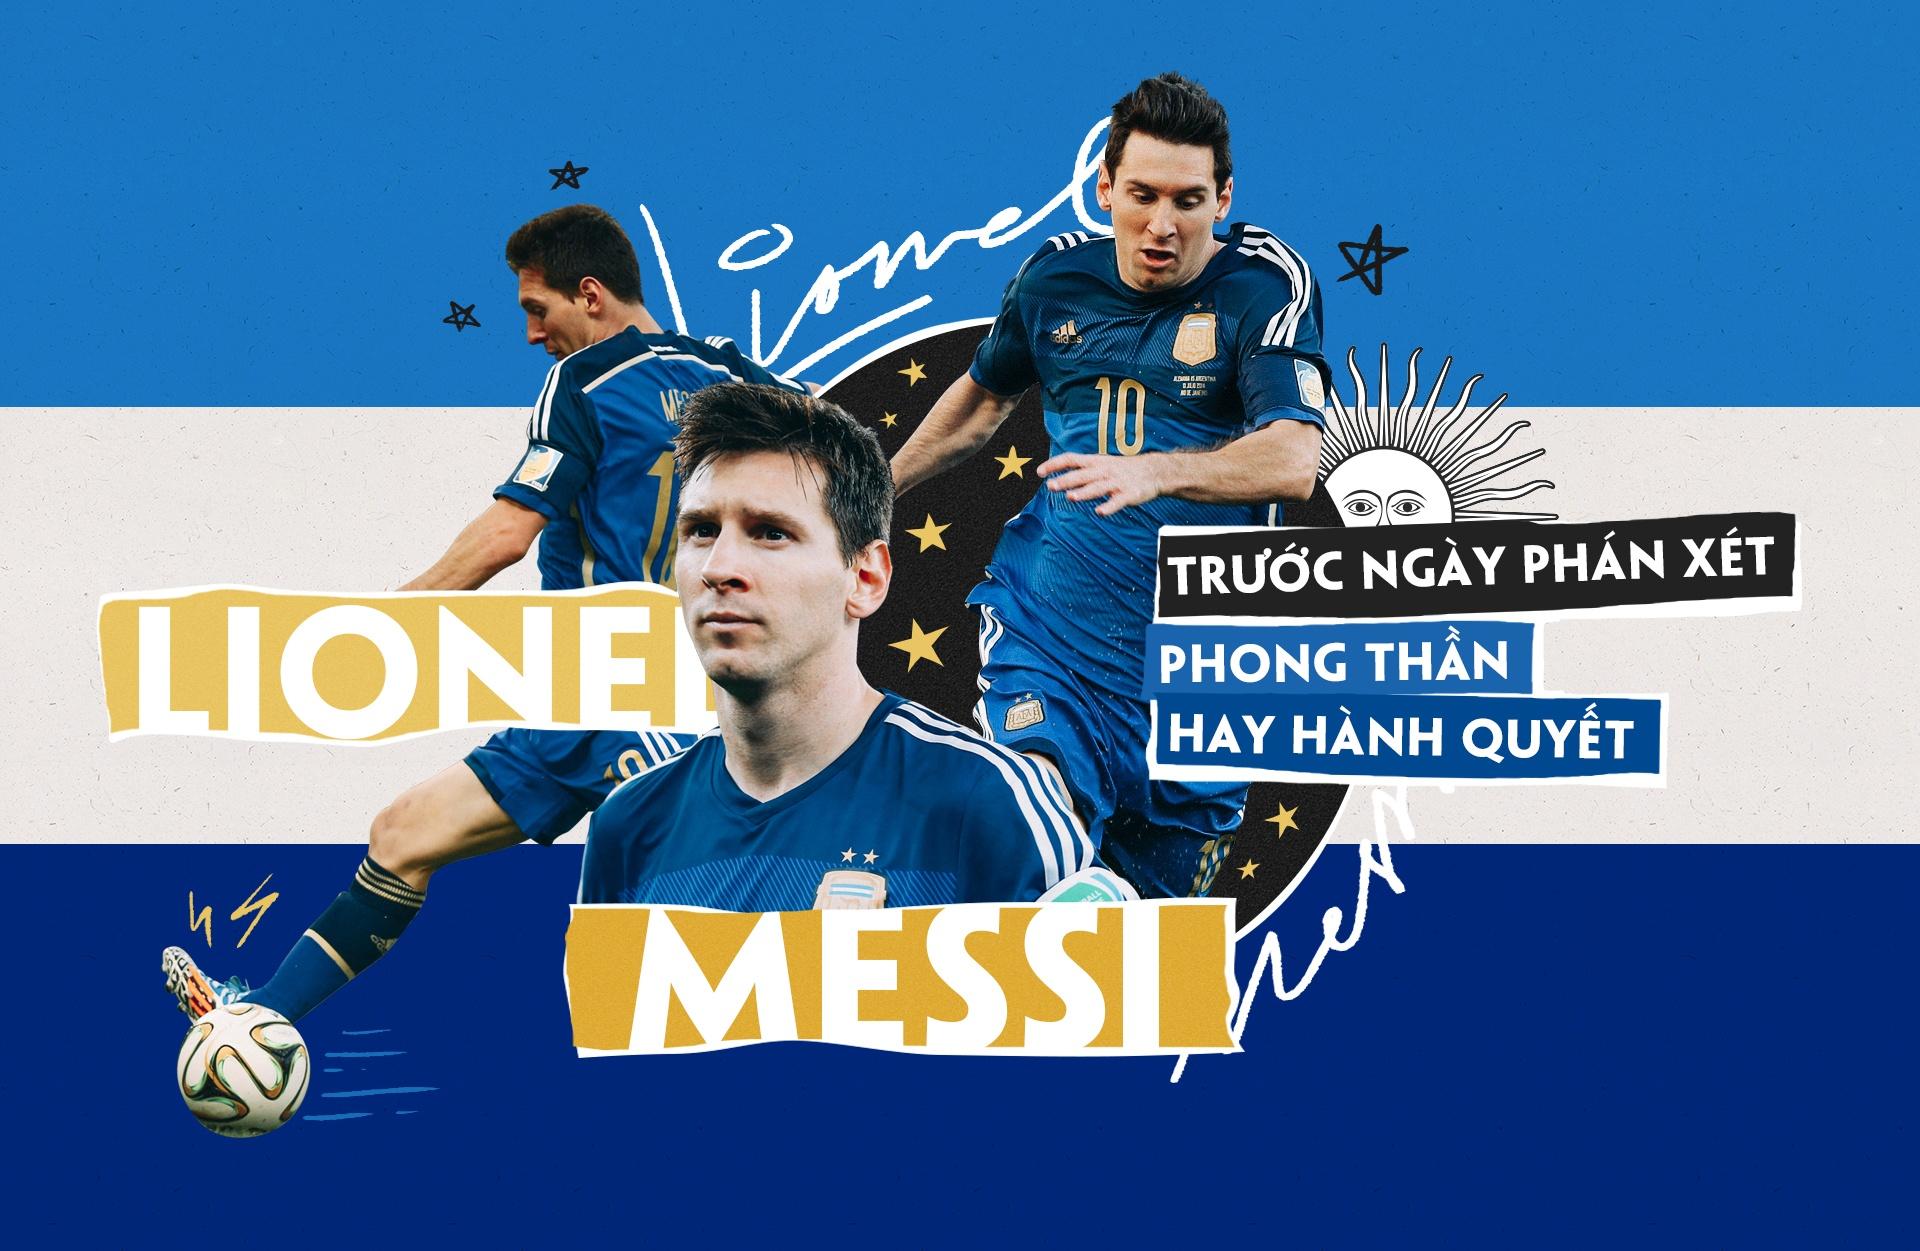 Lionel Messi truoc ngay phan xet, phong than hay bi hanh quyet? hinh anh 2